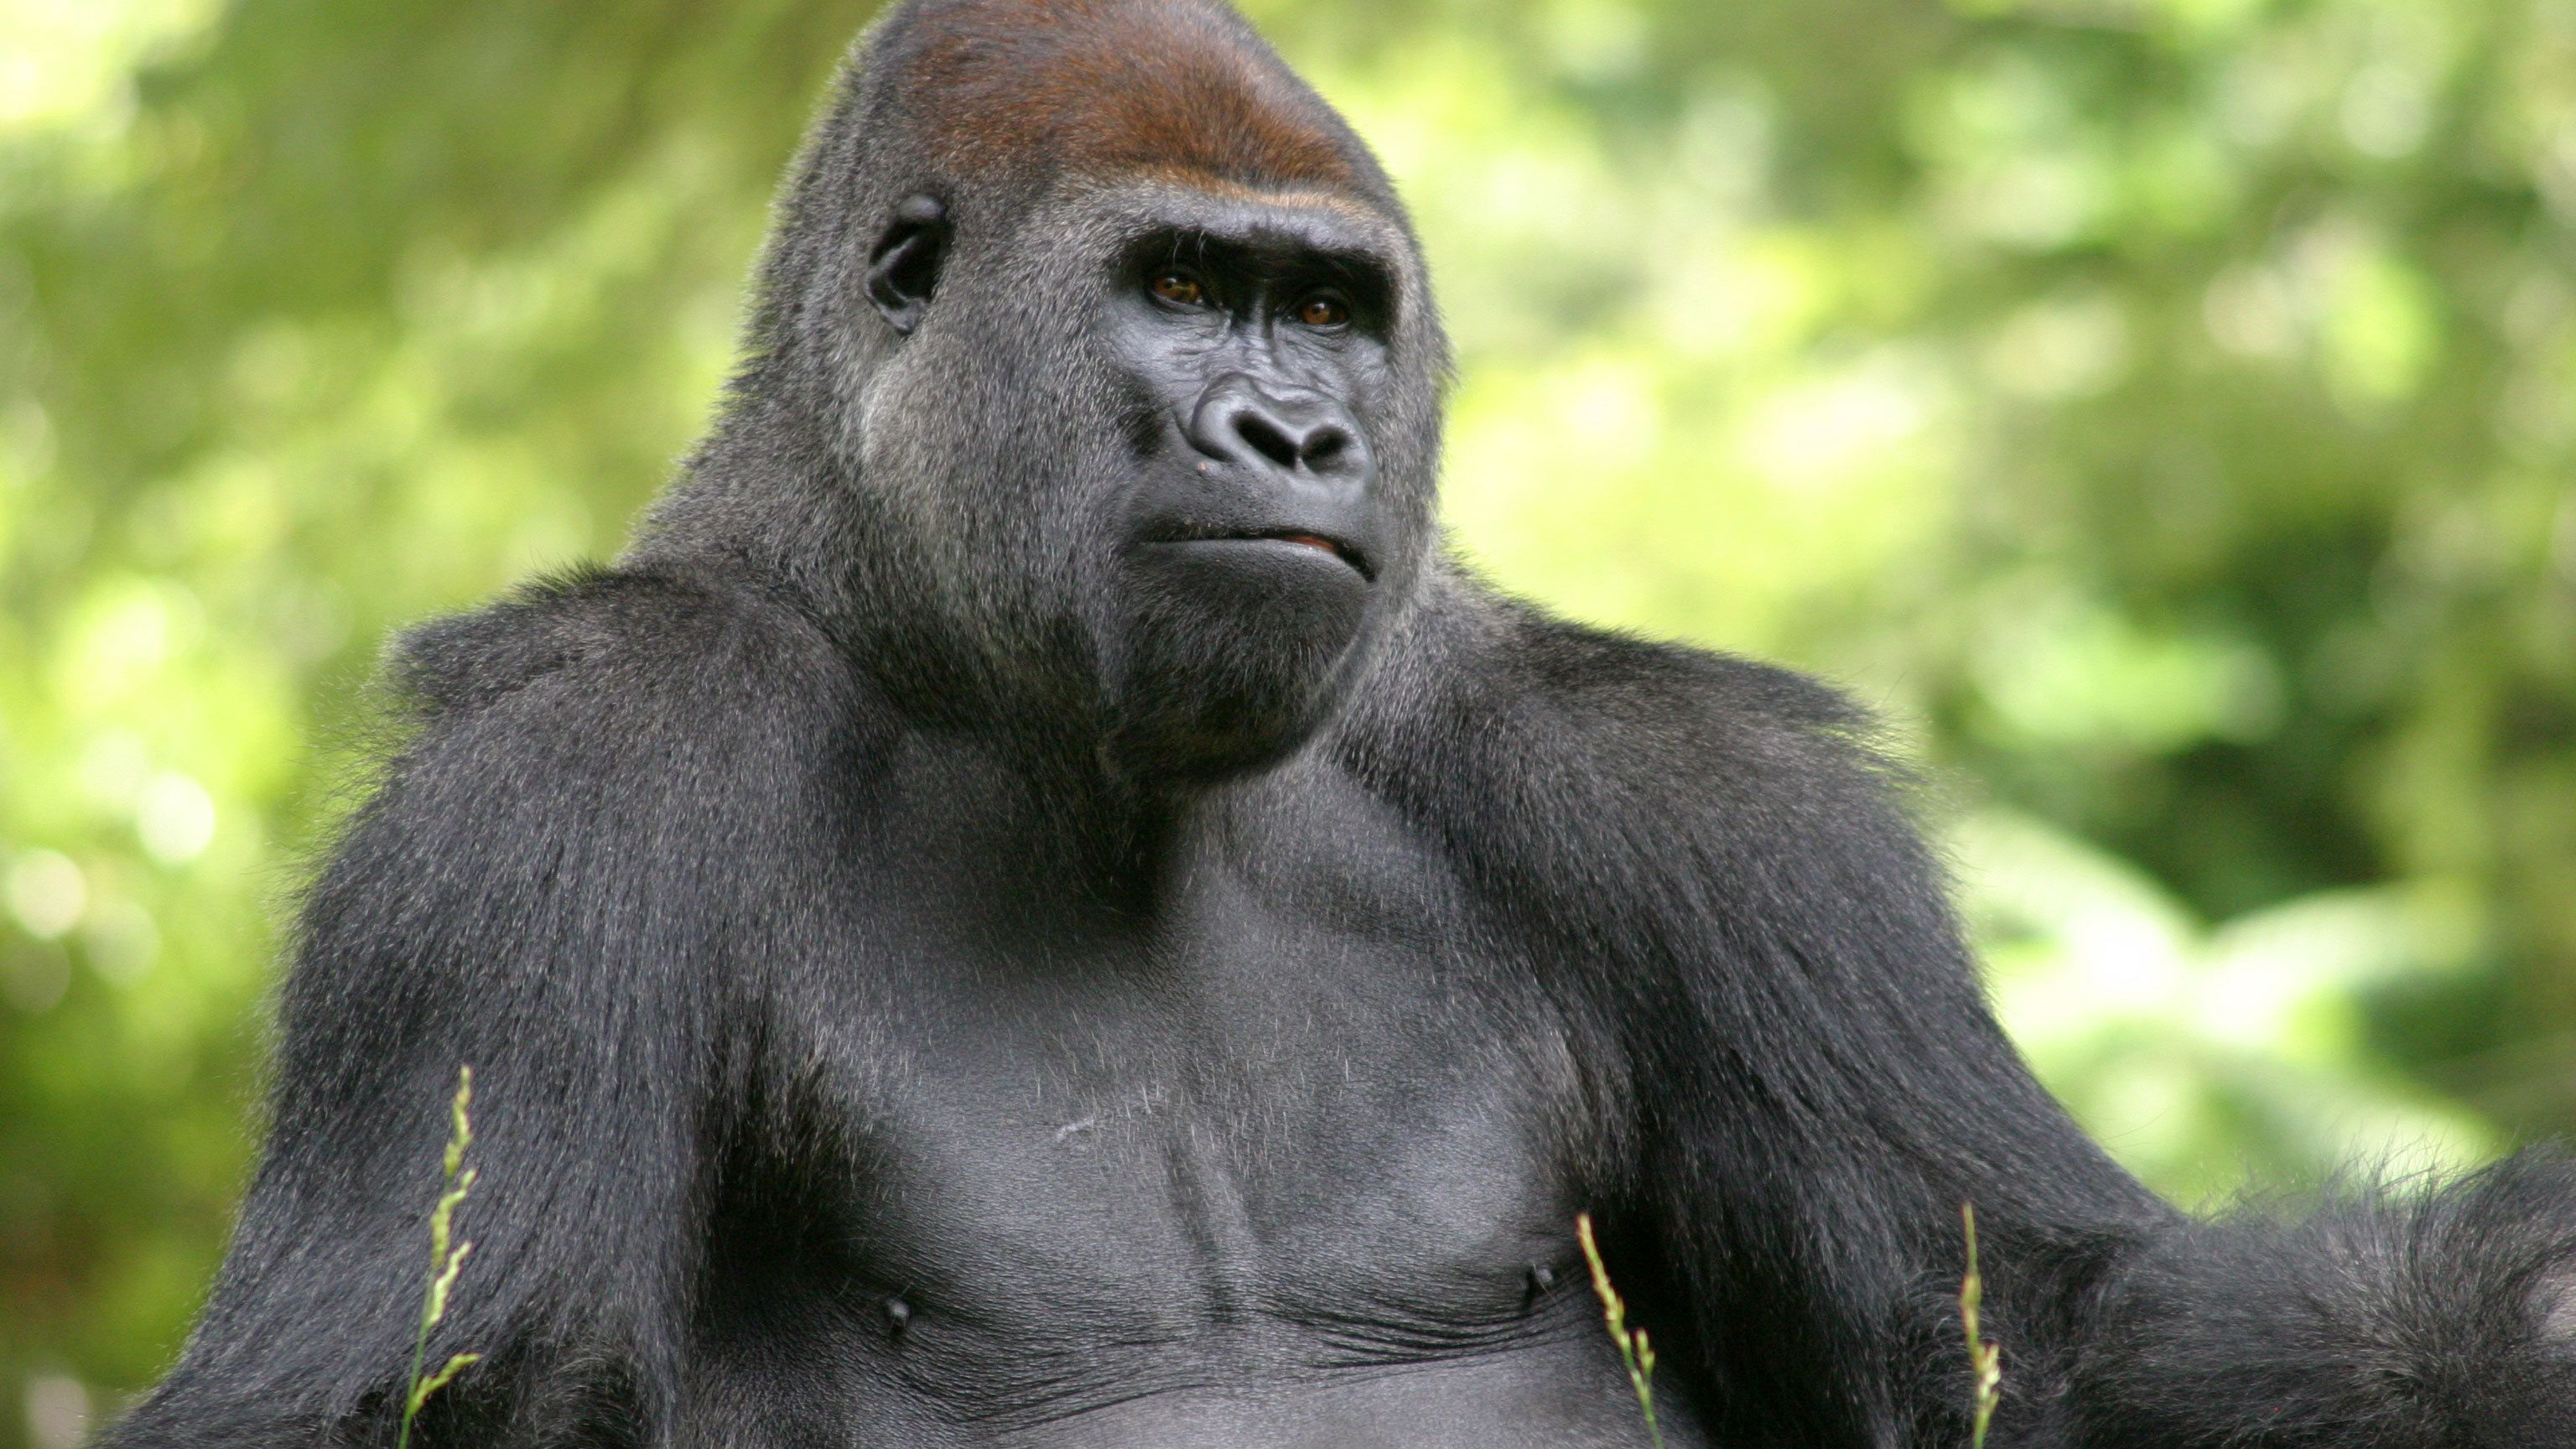 Gorilla gazing out onto the habitat within Zoo Atlanta